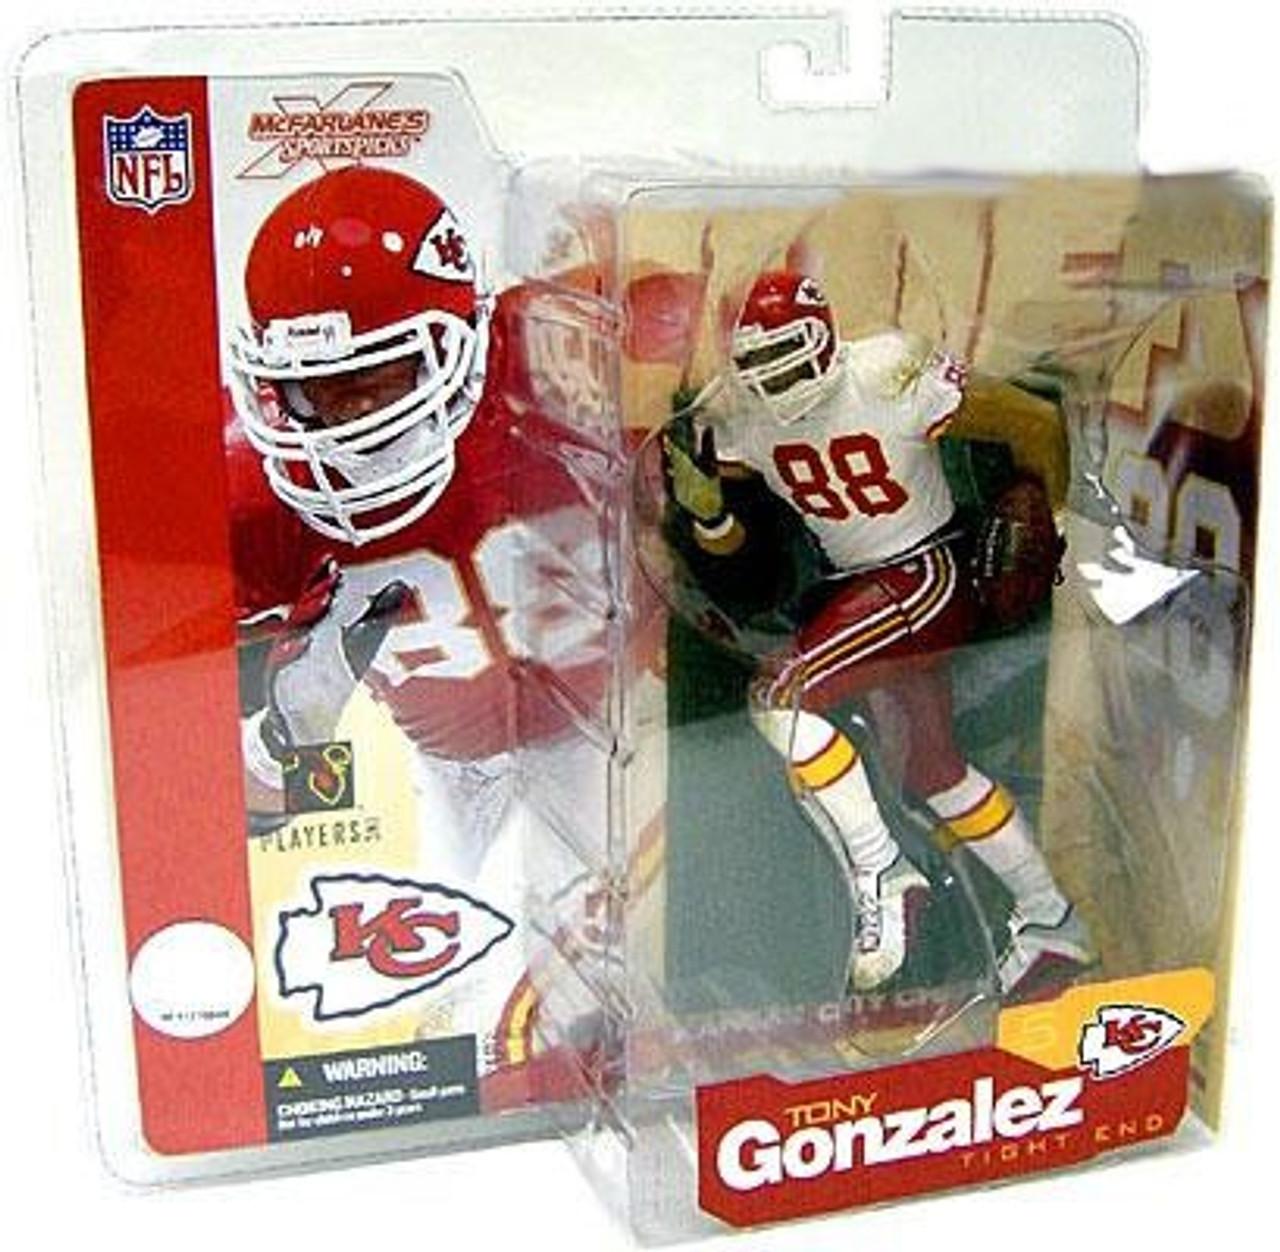 McFarlane Toys NFL Kansas City Chiefs Sports Picks Series 5 Tony Gonzalez  Action Figure White Jersey Variant - ToyWiz f48c584e2